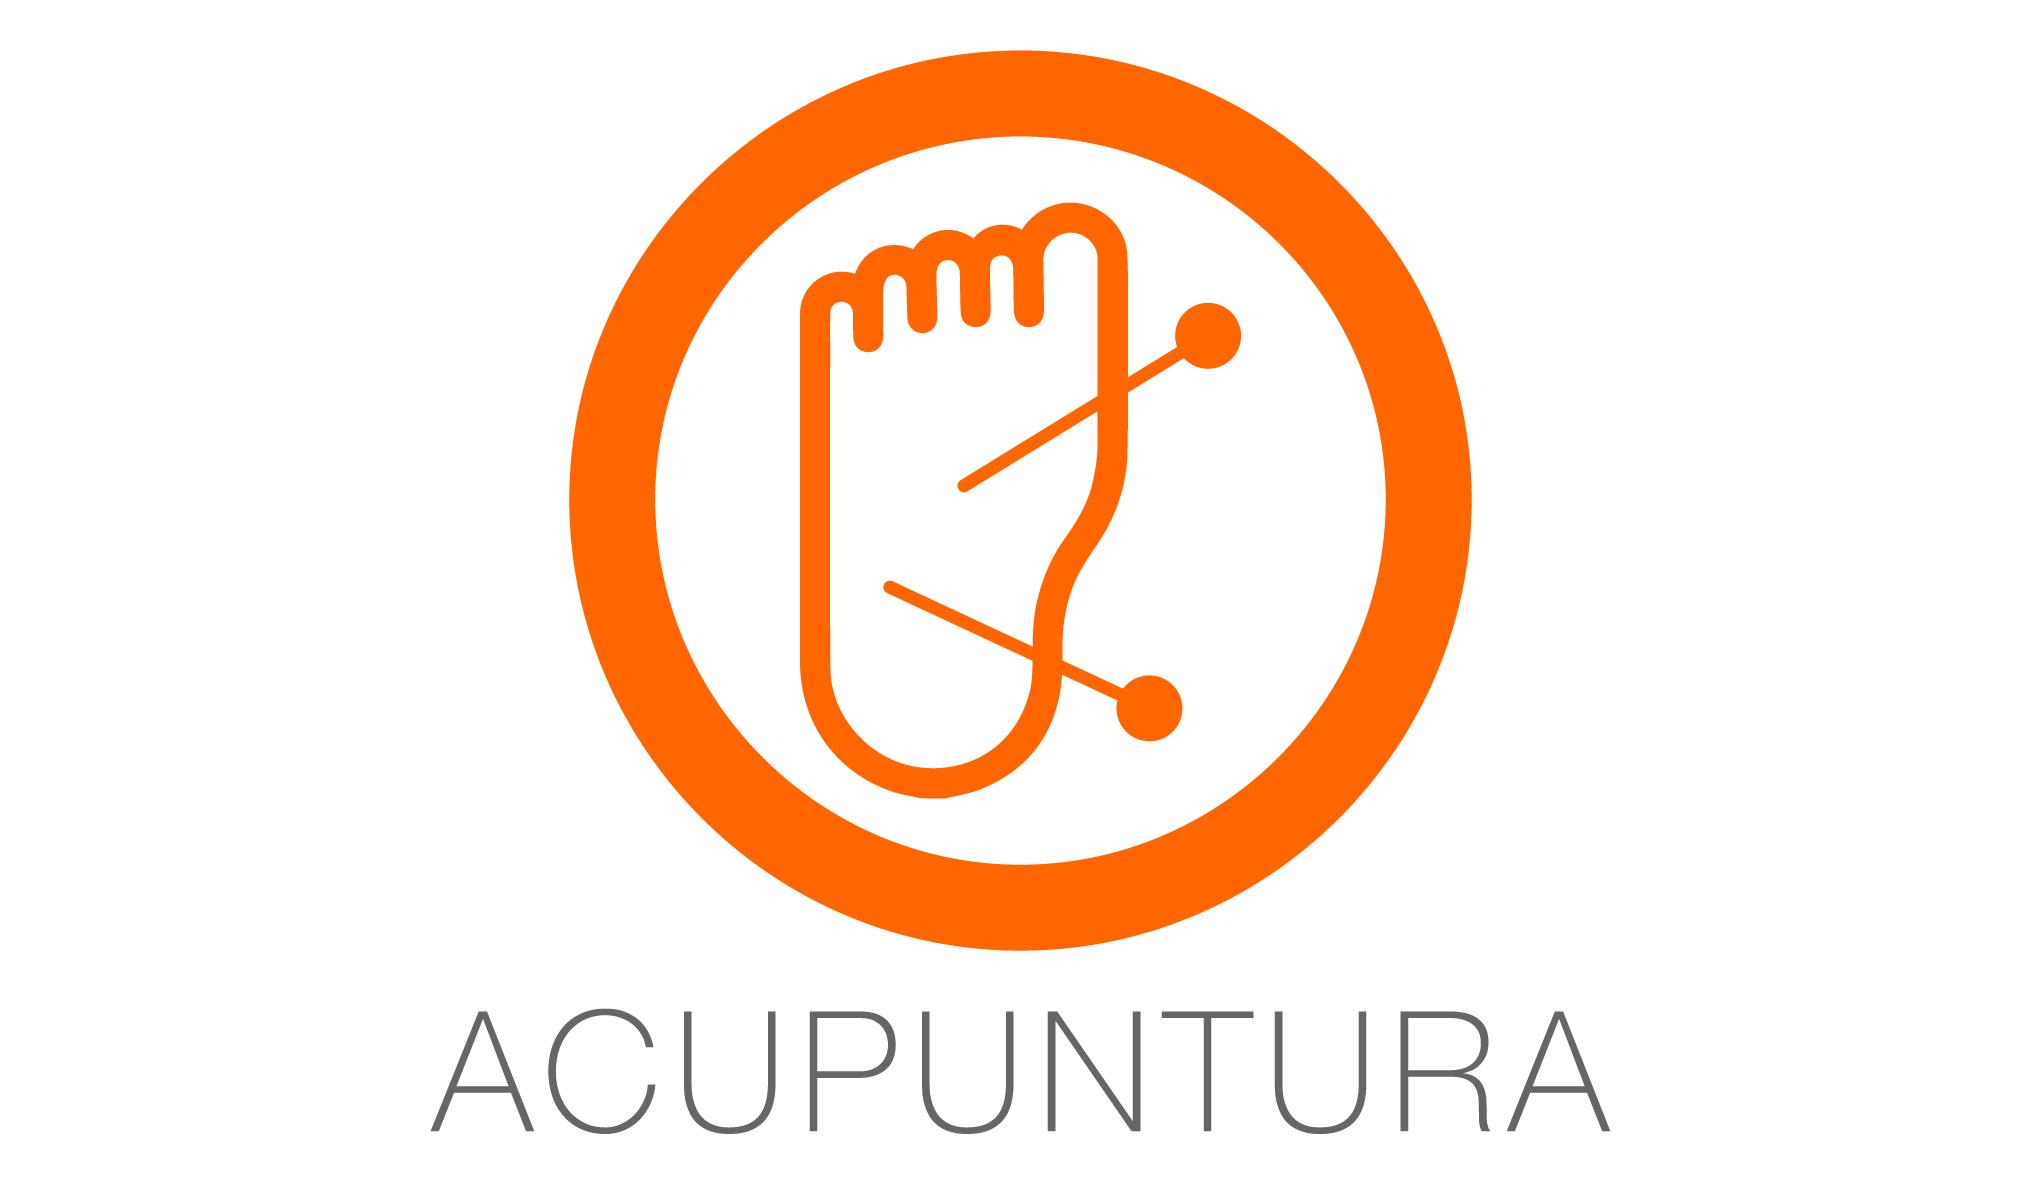 https://0201.nccdn.net/1_2/000/000/13b/008/acupuntura-2040x1184.jpg